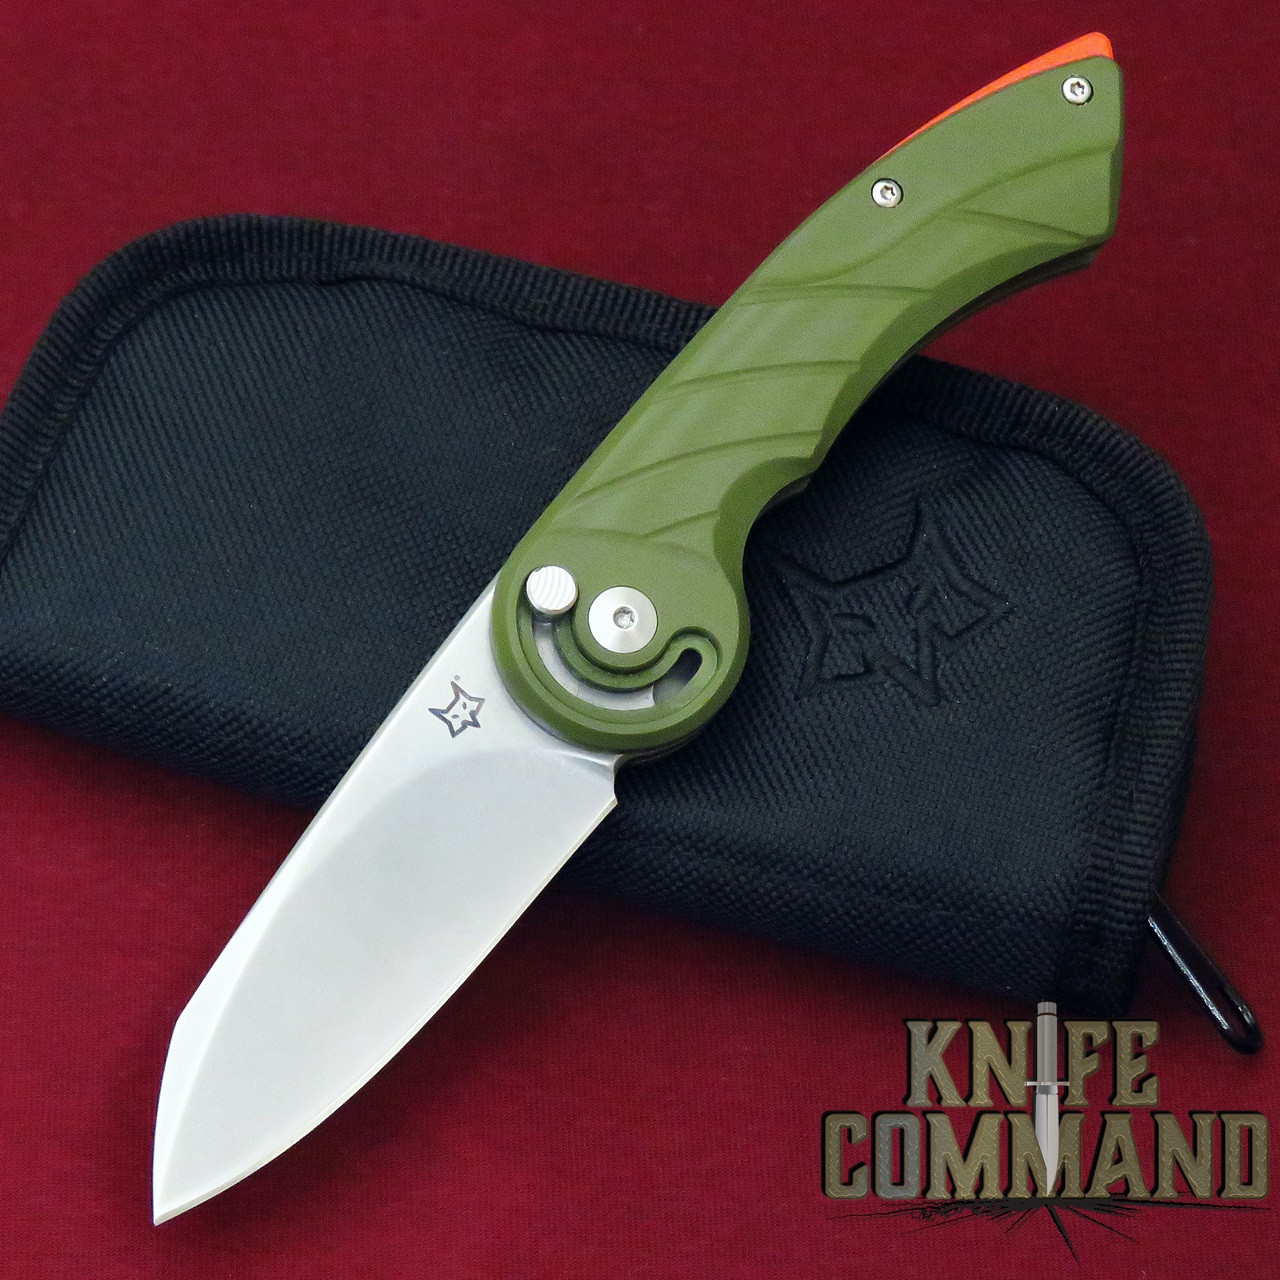 Fox Knives Radius Olive Drab Green / Orange Spacer Folding Knife FX-550 G10 OD